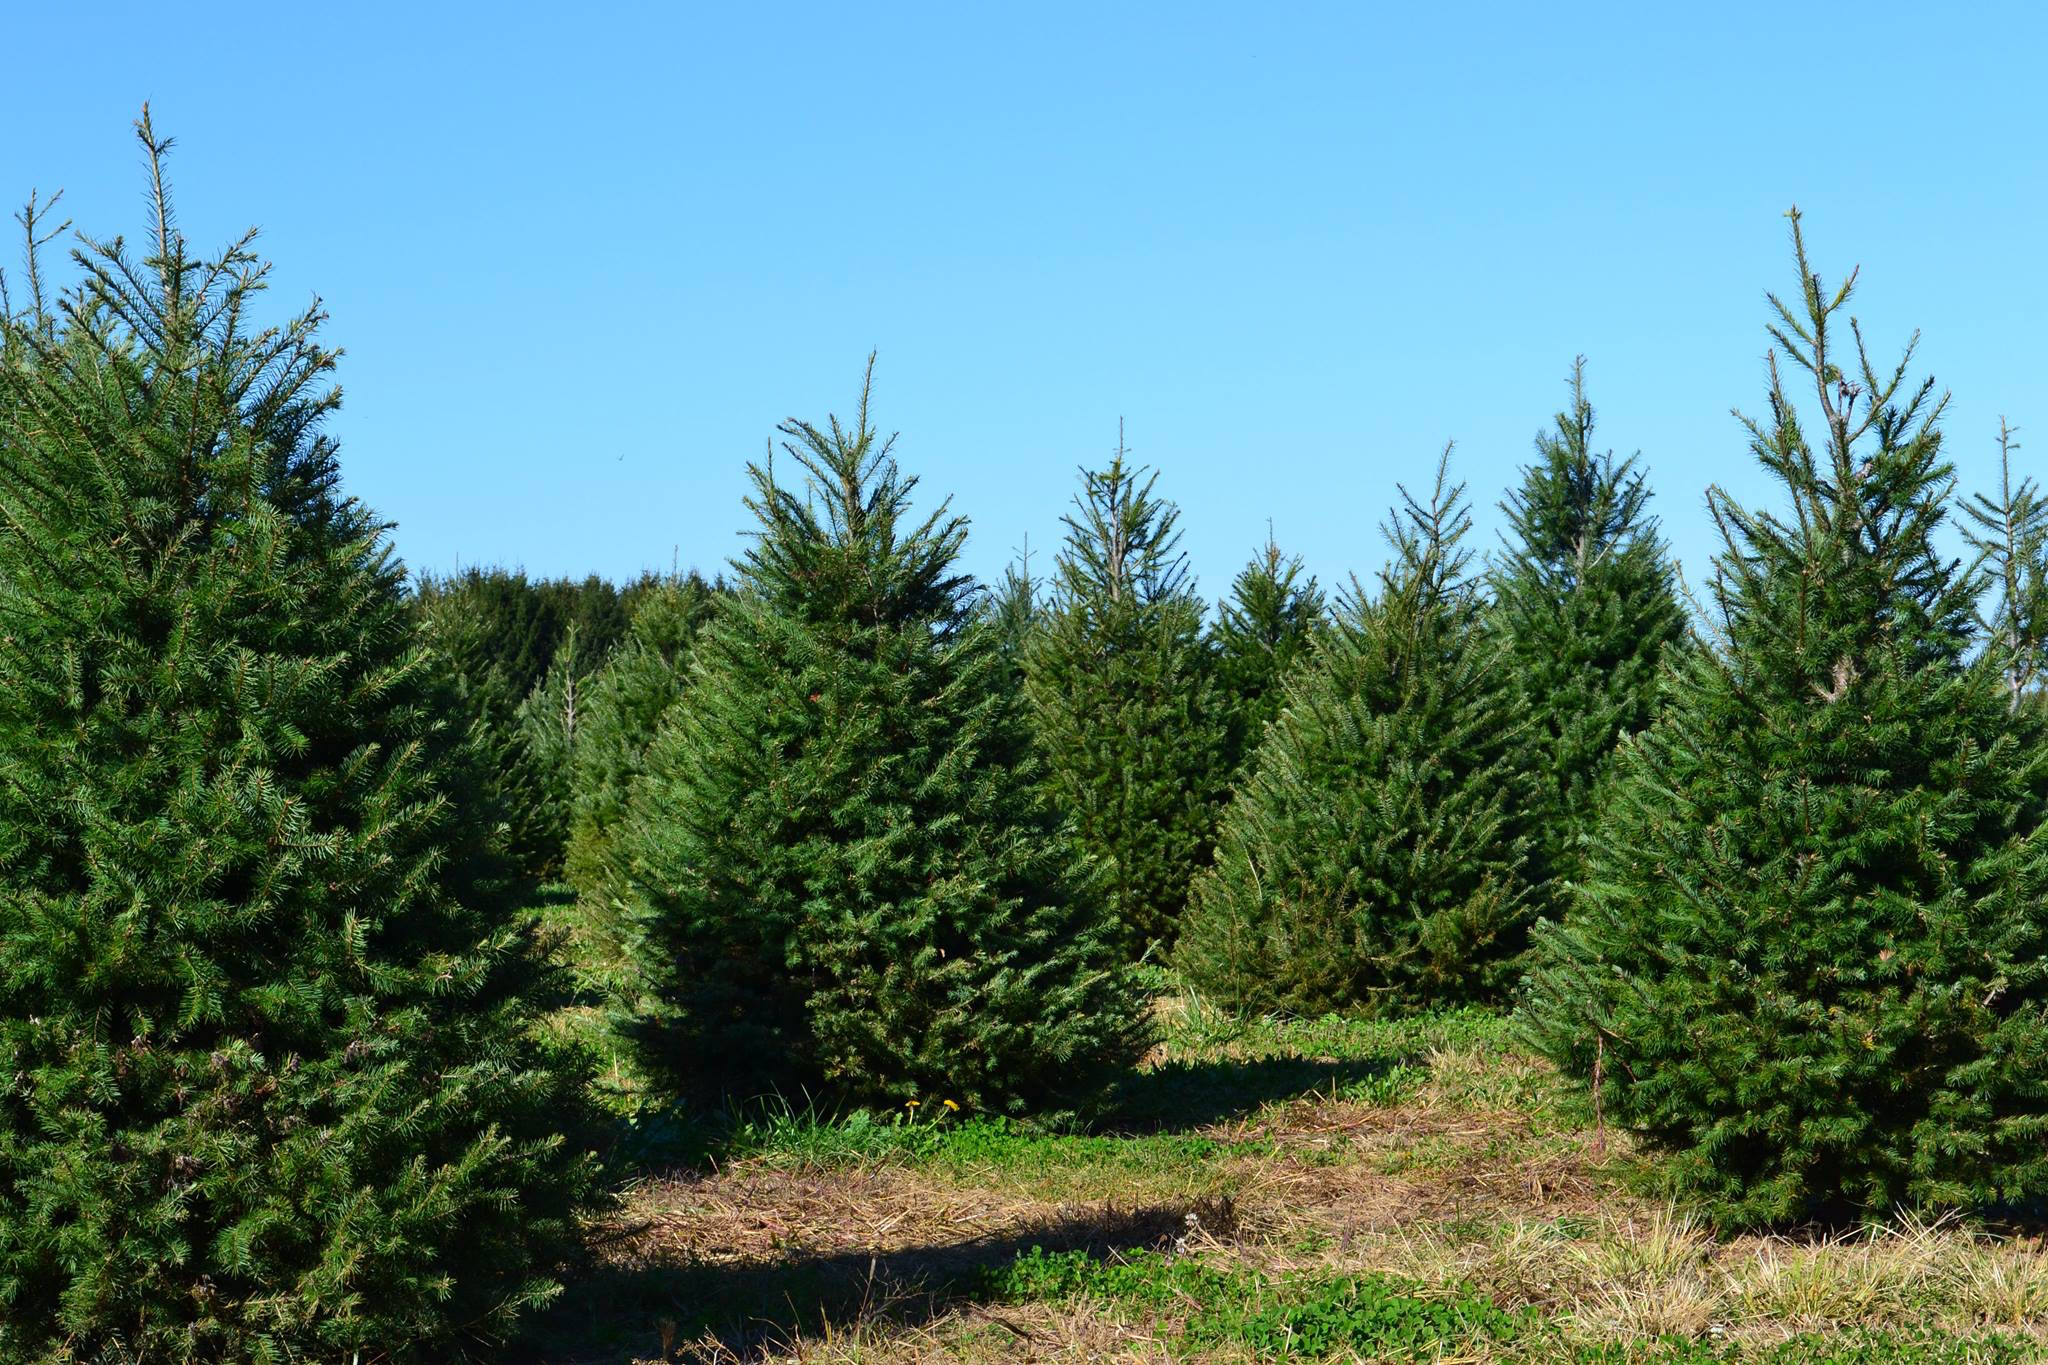 image: www.facebook.com/santaschristmastreefarm